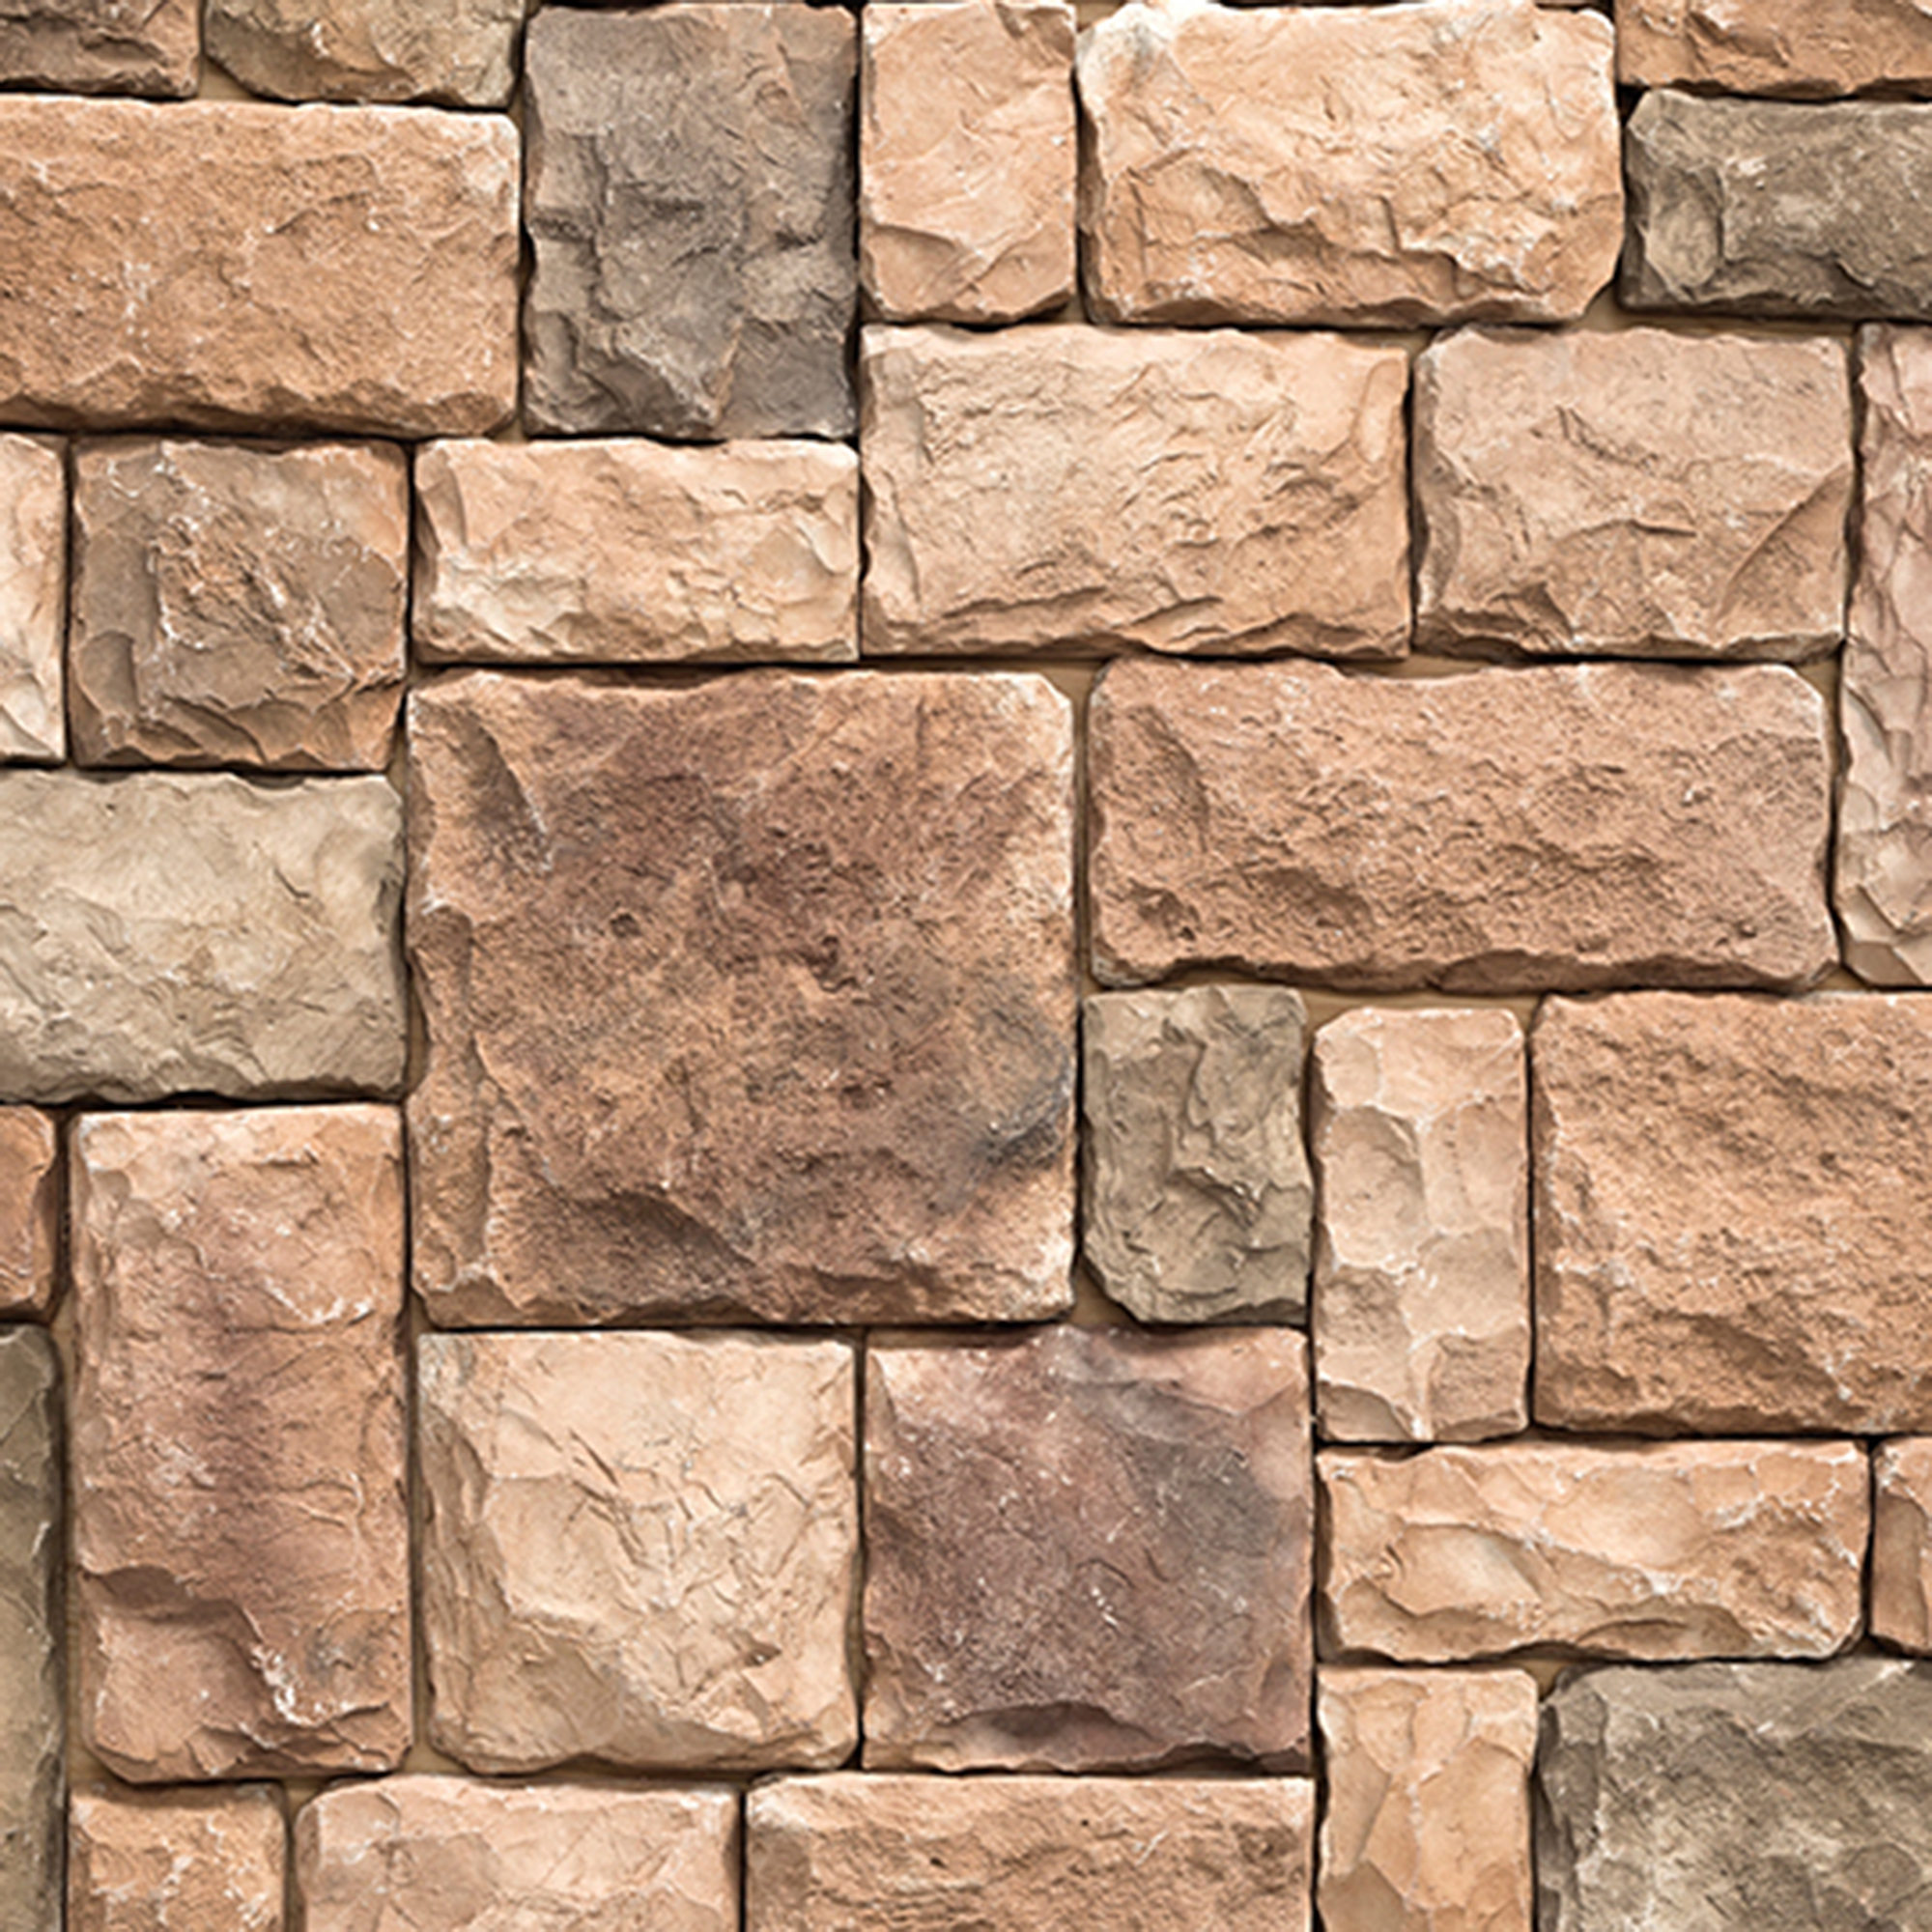 Cobblestone Koni Materials